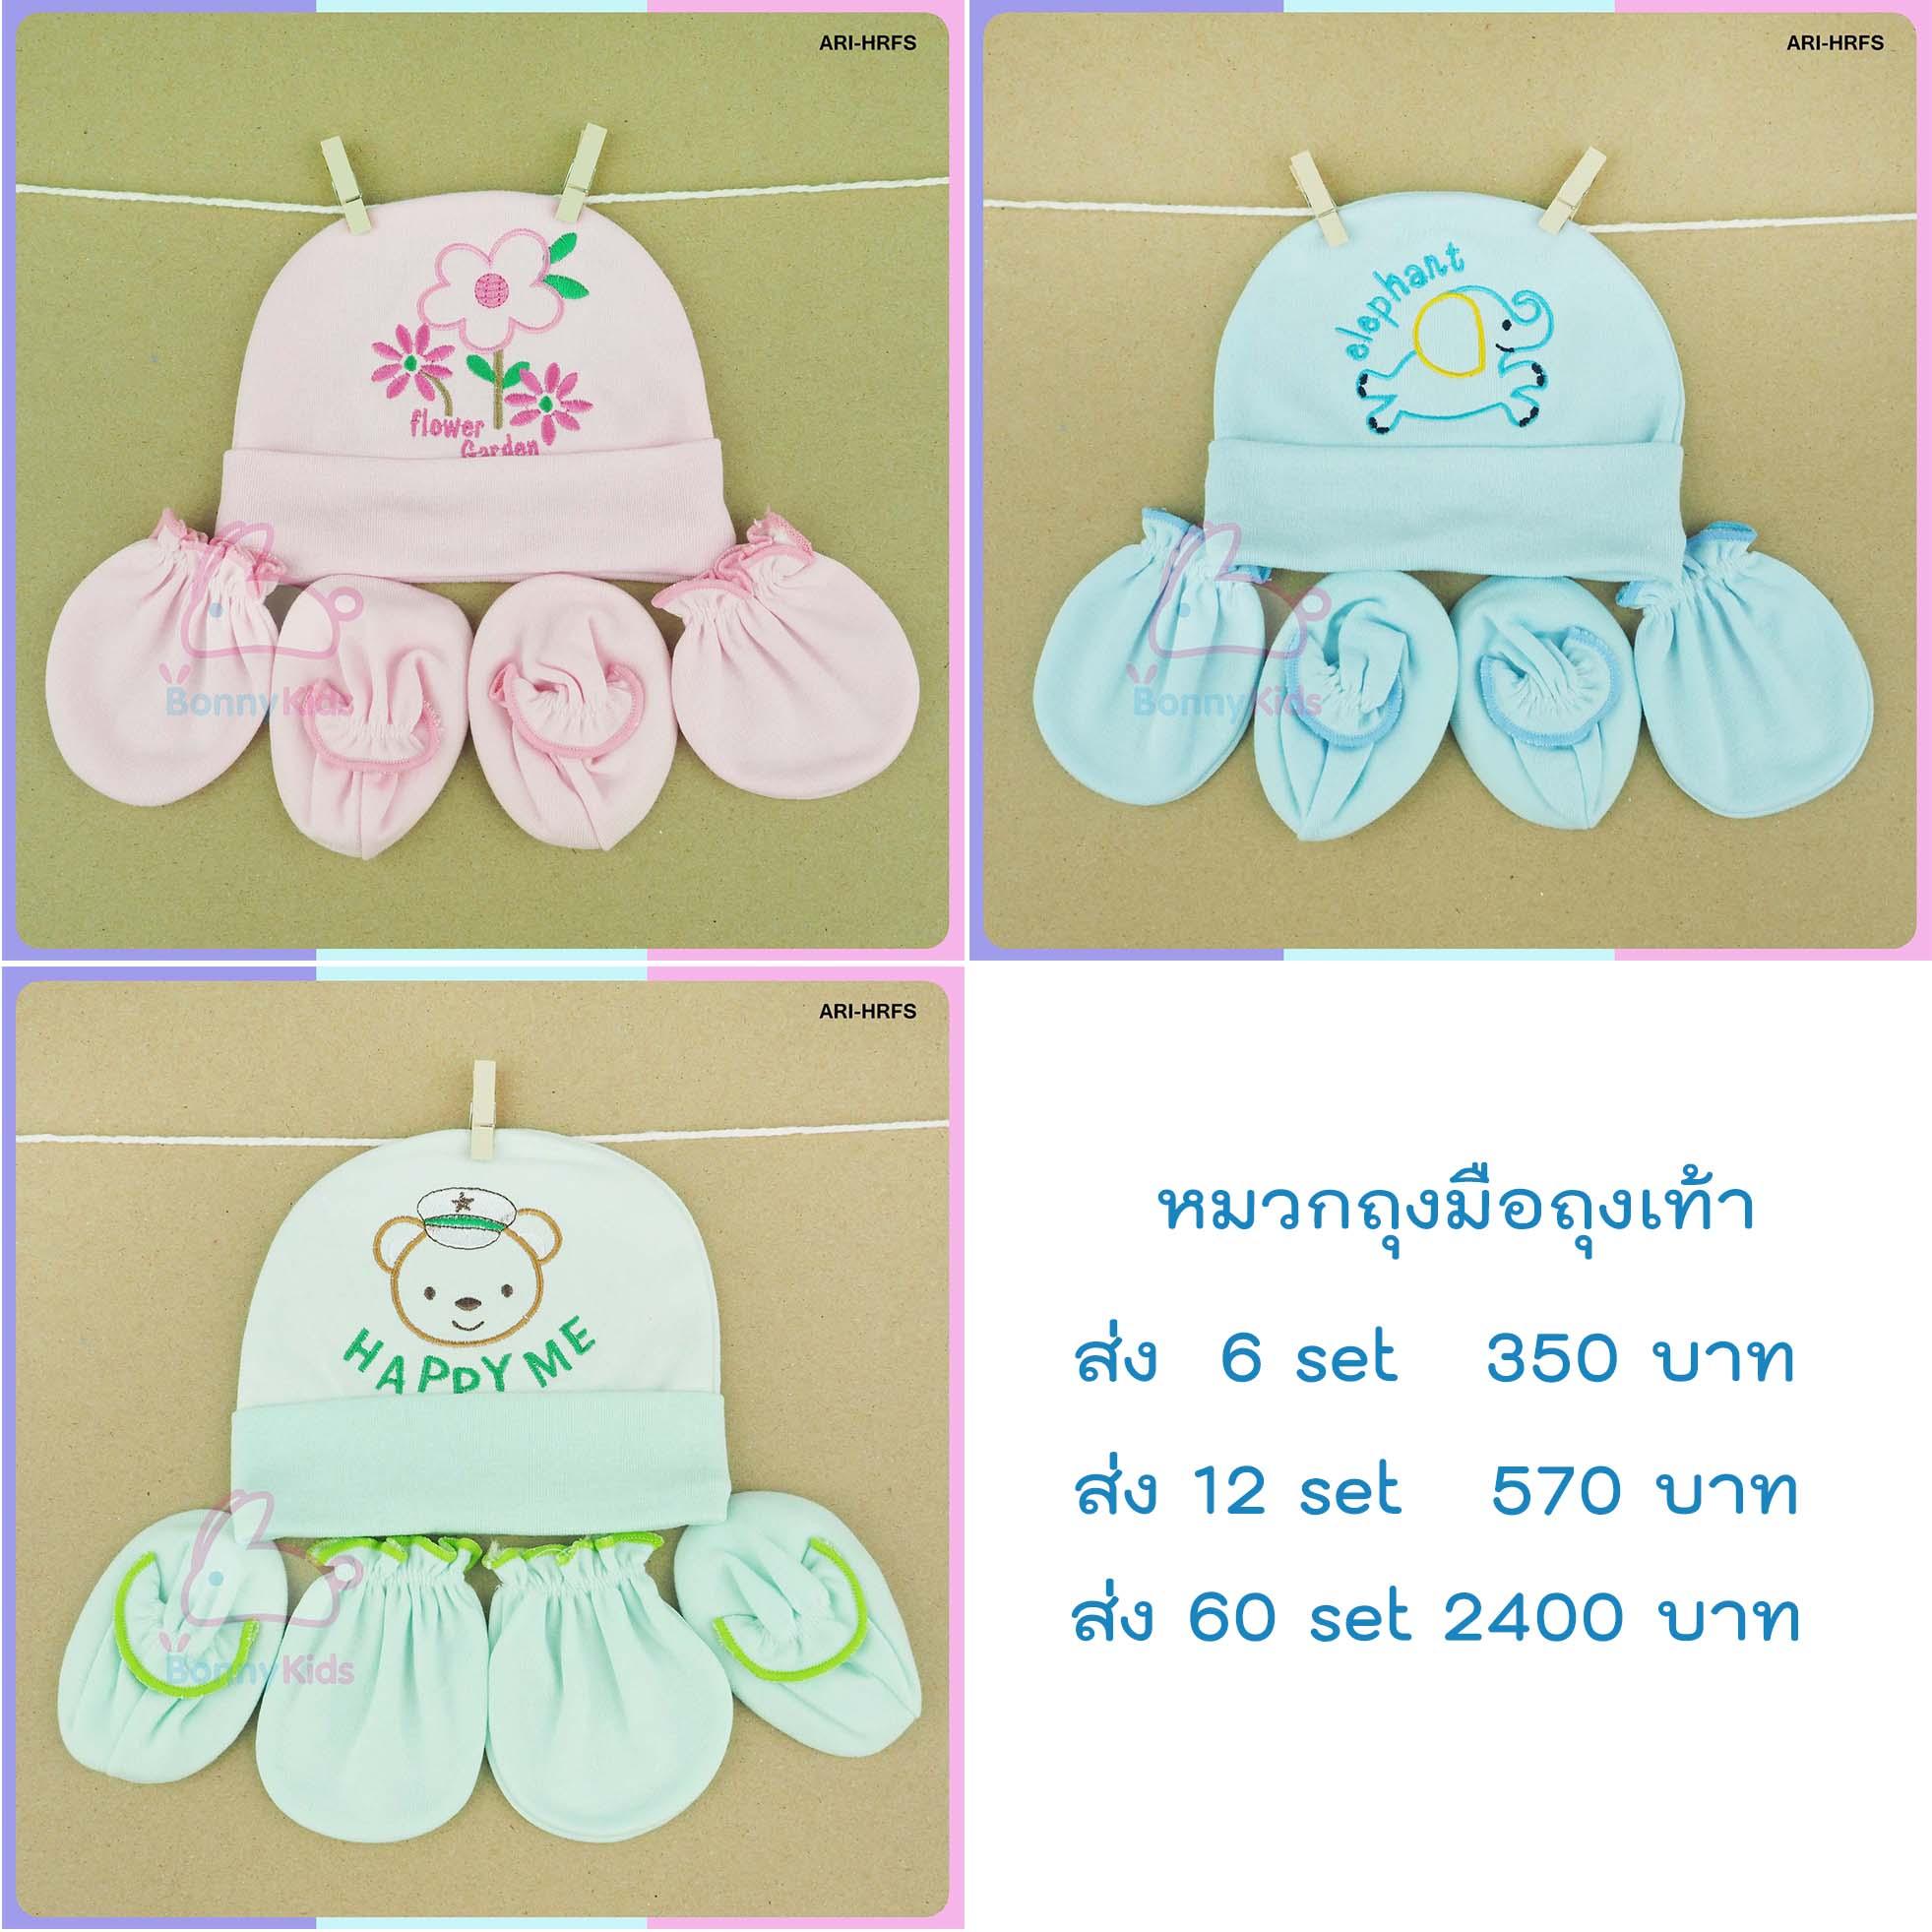 ARI-HRFS หมวก+ถุงมือ+ถุงเท้าเดี่ยวเสริมฟองน้ำ ผ้าปัก